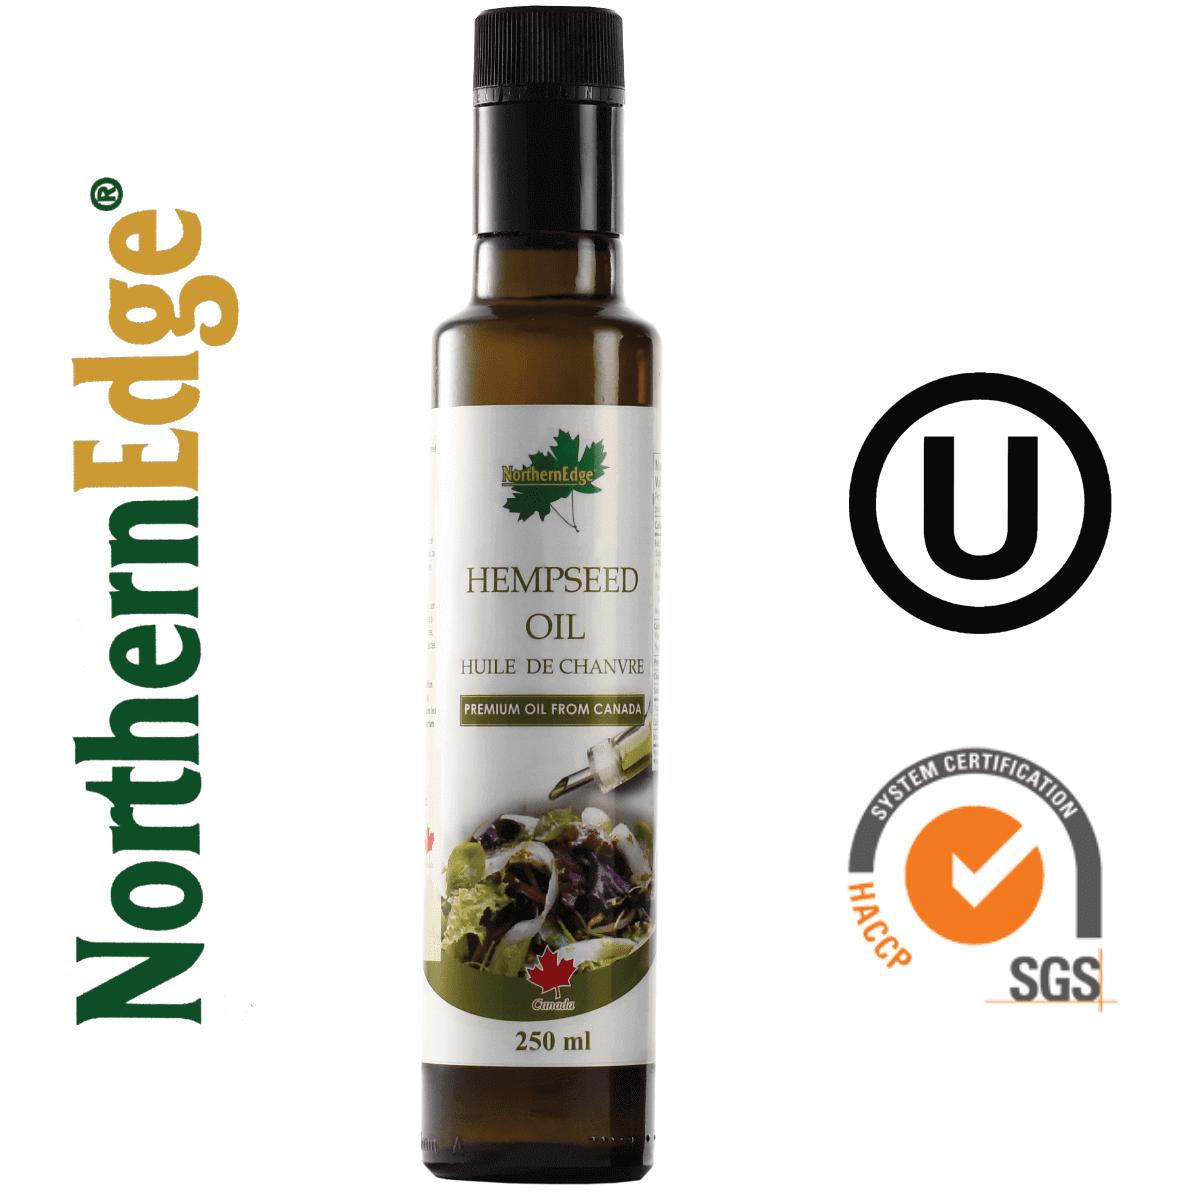 NorthernEdge® Organic & Conventional Hemp Oil or Hempseed Oil